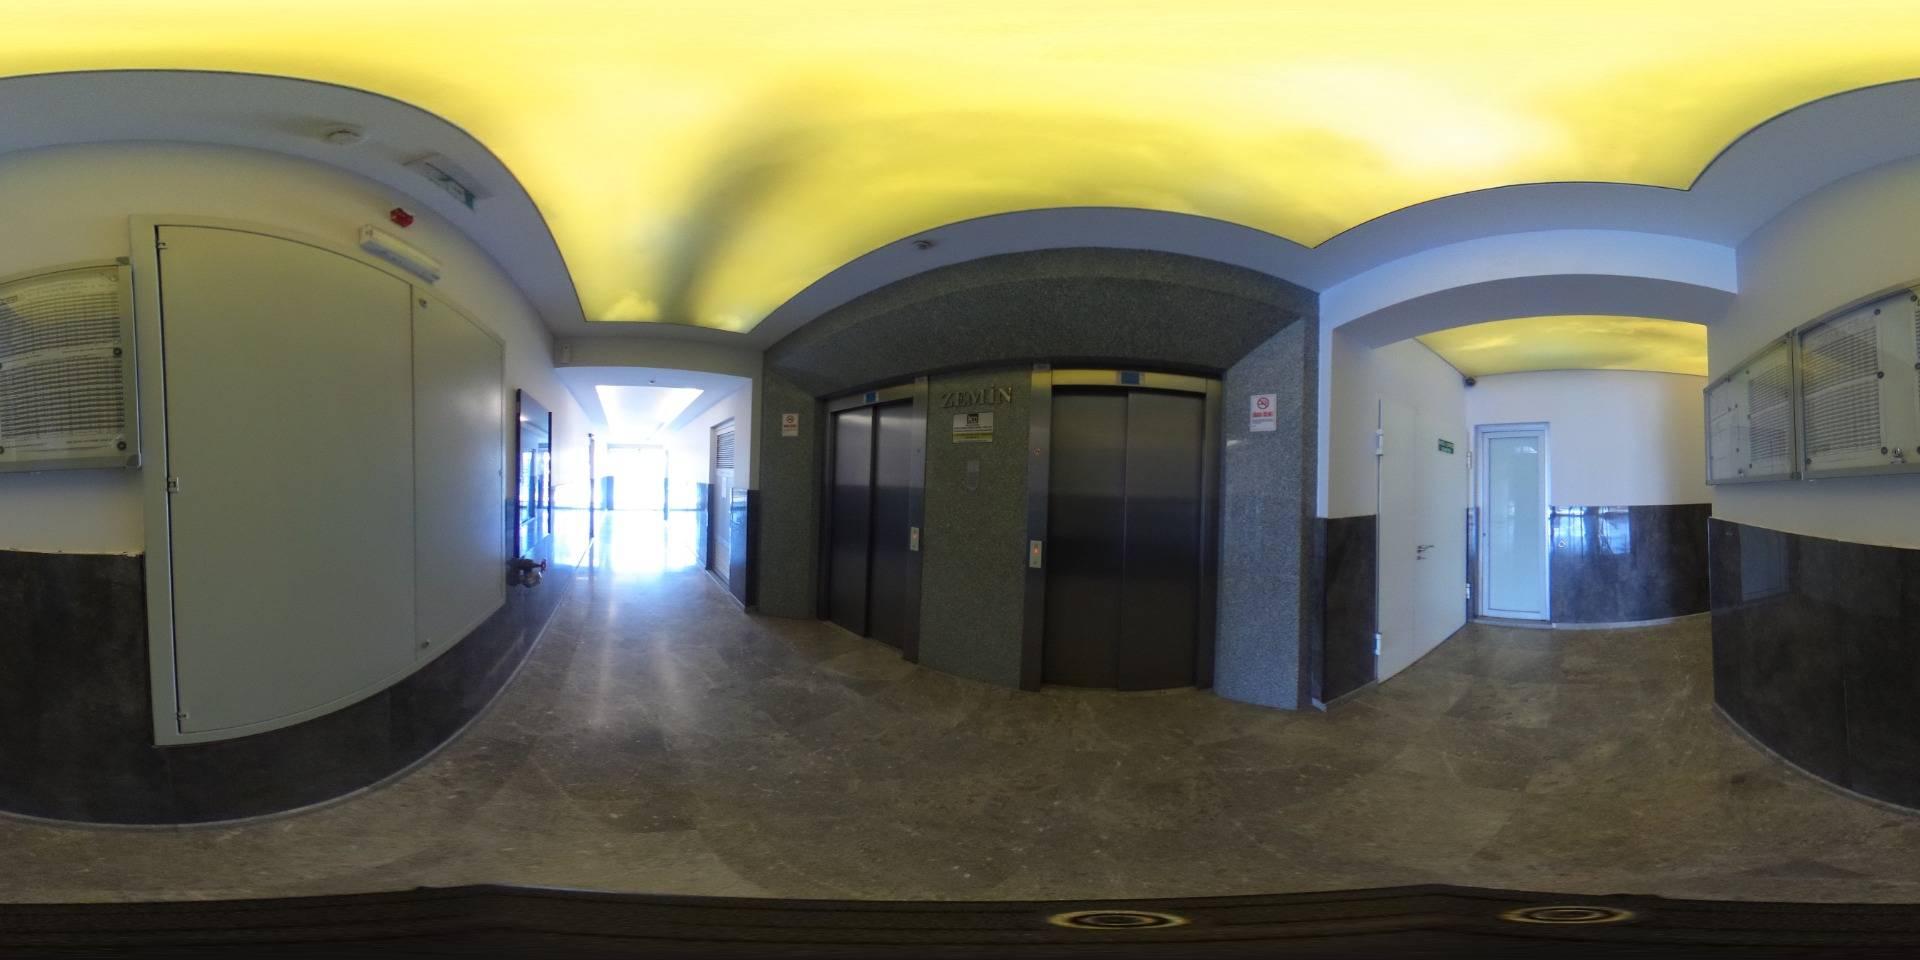 35 EMLAK'tan LOBİ PLATINIUM'da 134 m2 brut 100m2 net